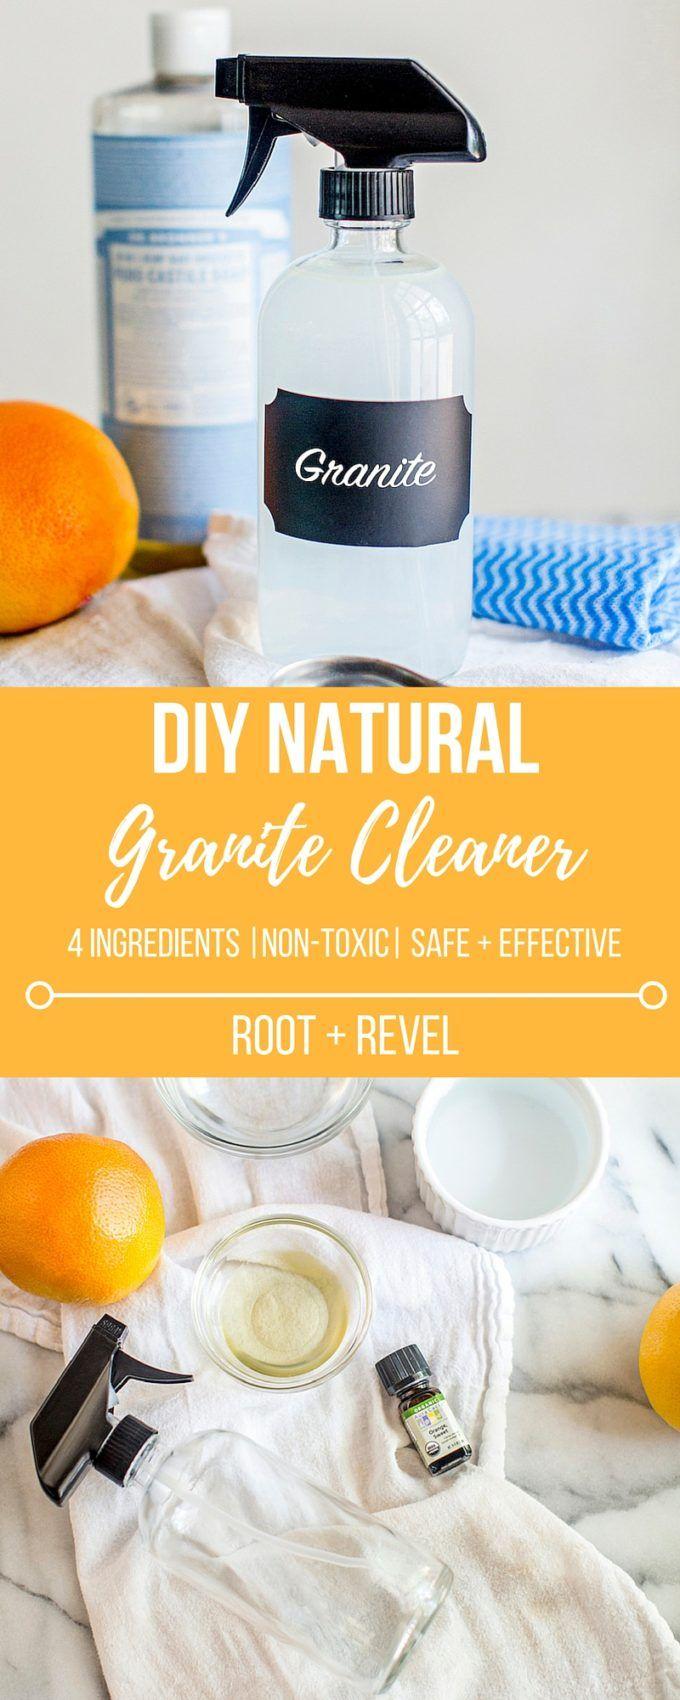 Diy Natural Granite Cleaner With Essential Oils Recipe